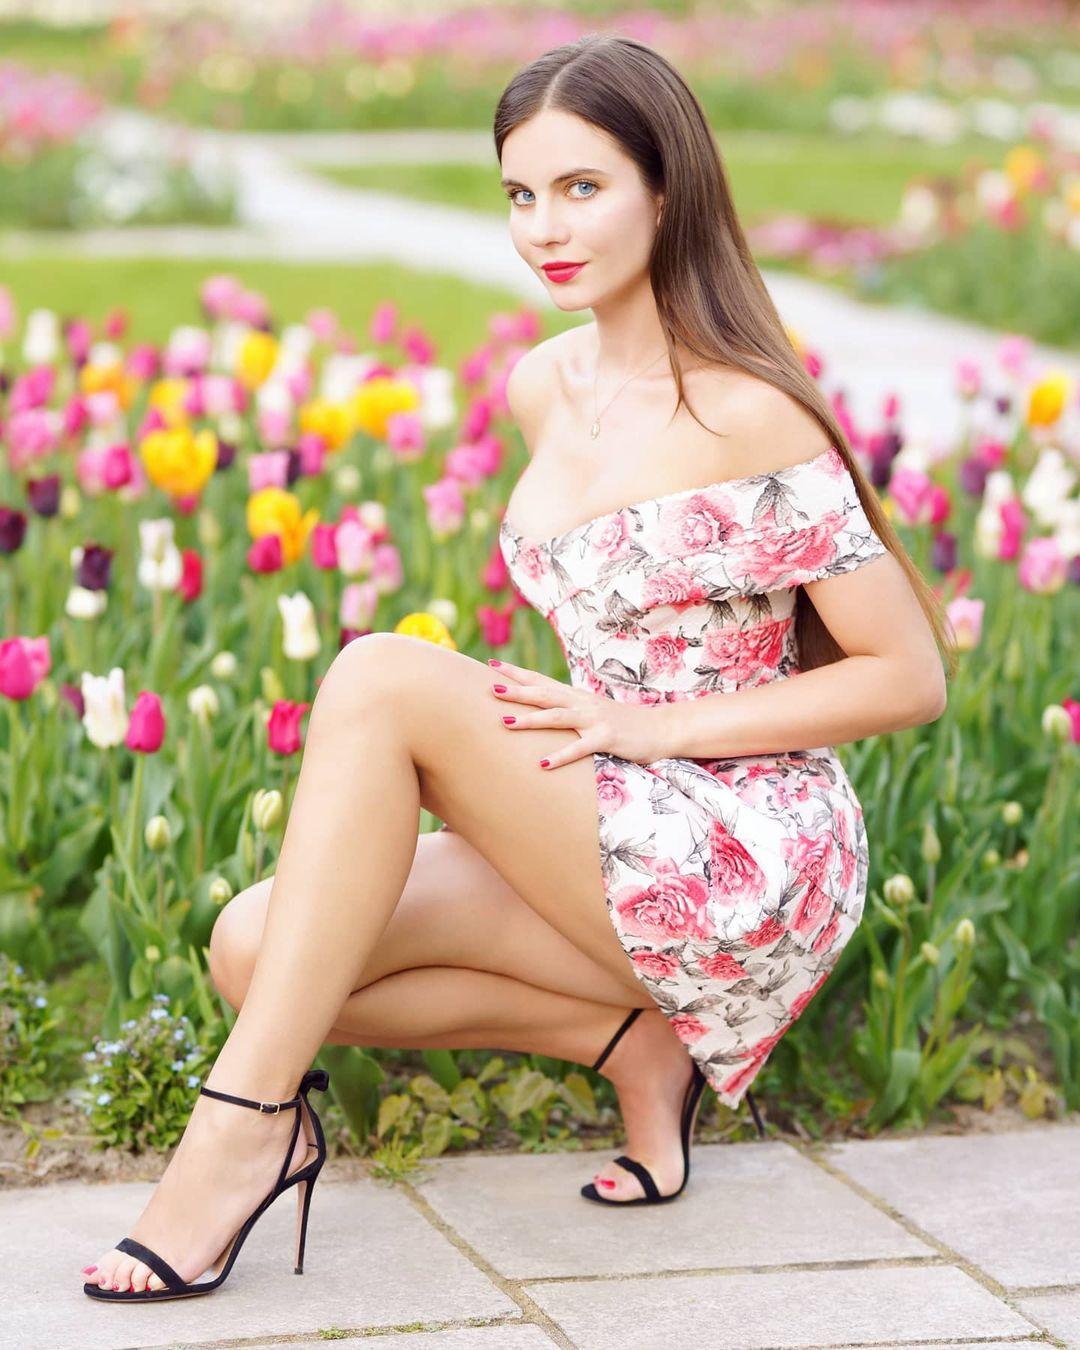 Ariadna - девушка дня из инстаграм (27 Фото) 27